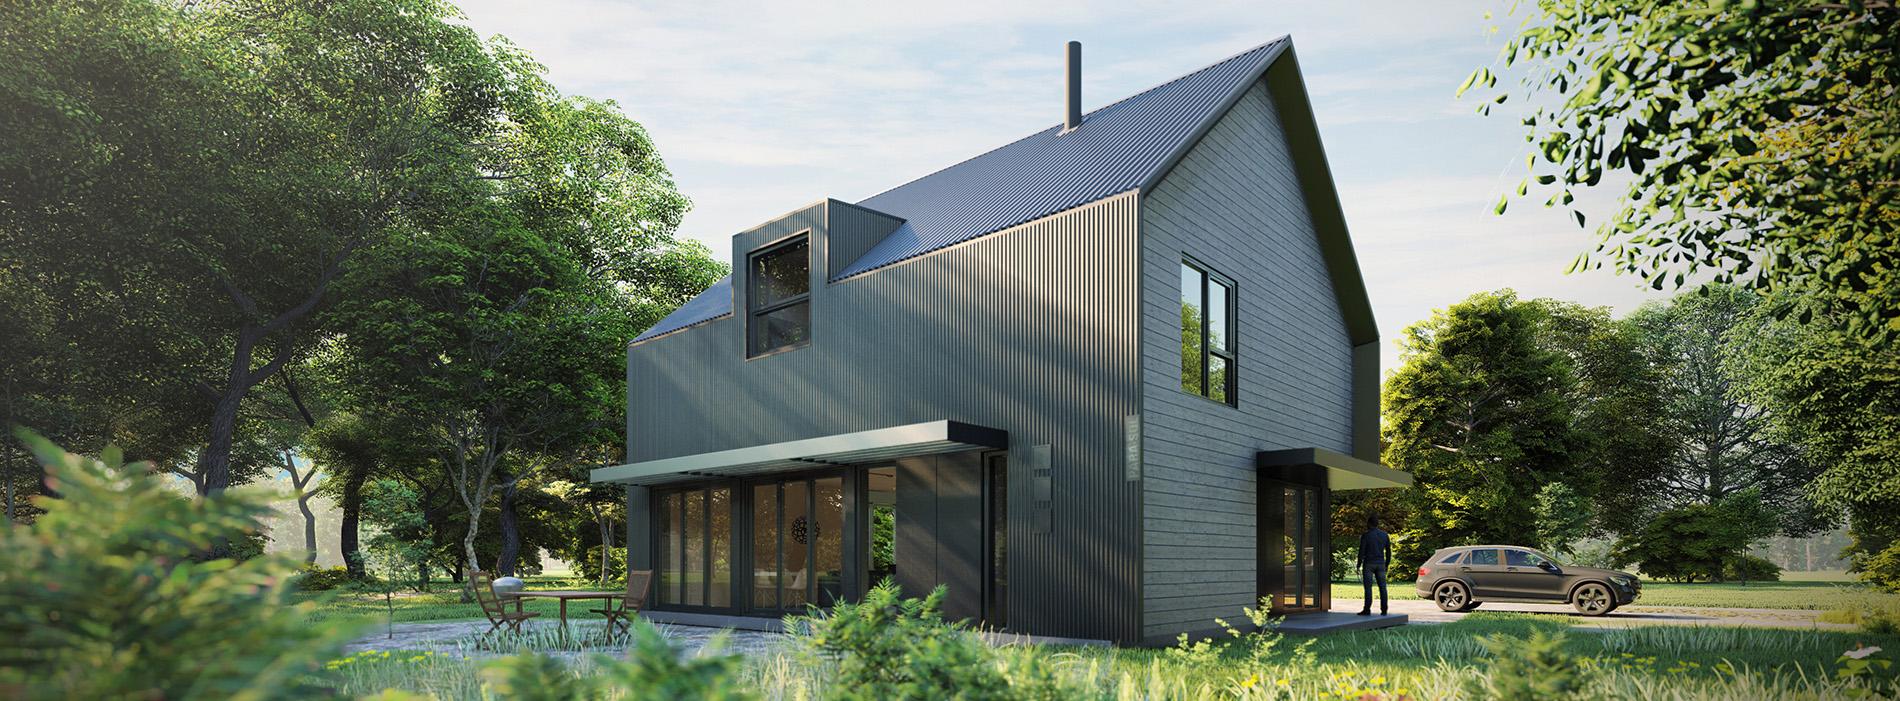 Formica Canada partners with Eco Home, Eco Home model kit, prefabricated architect designed ecologibal house, Eco Habitat S1600